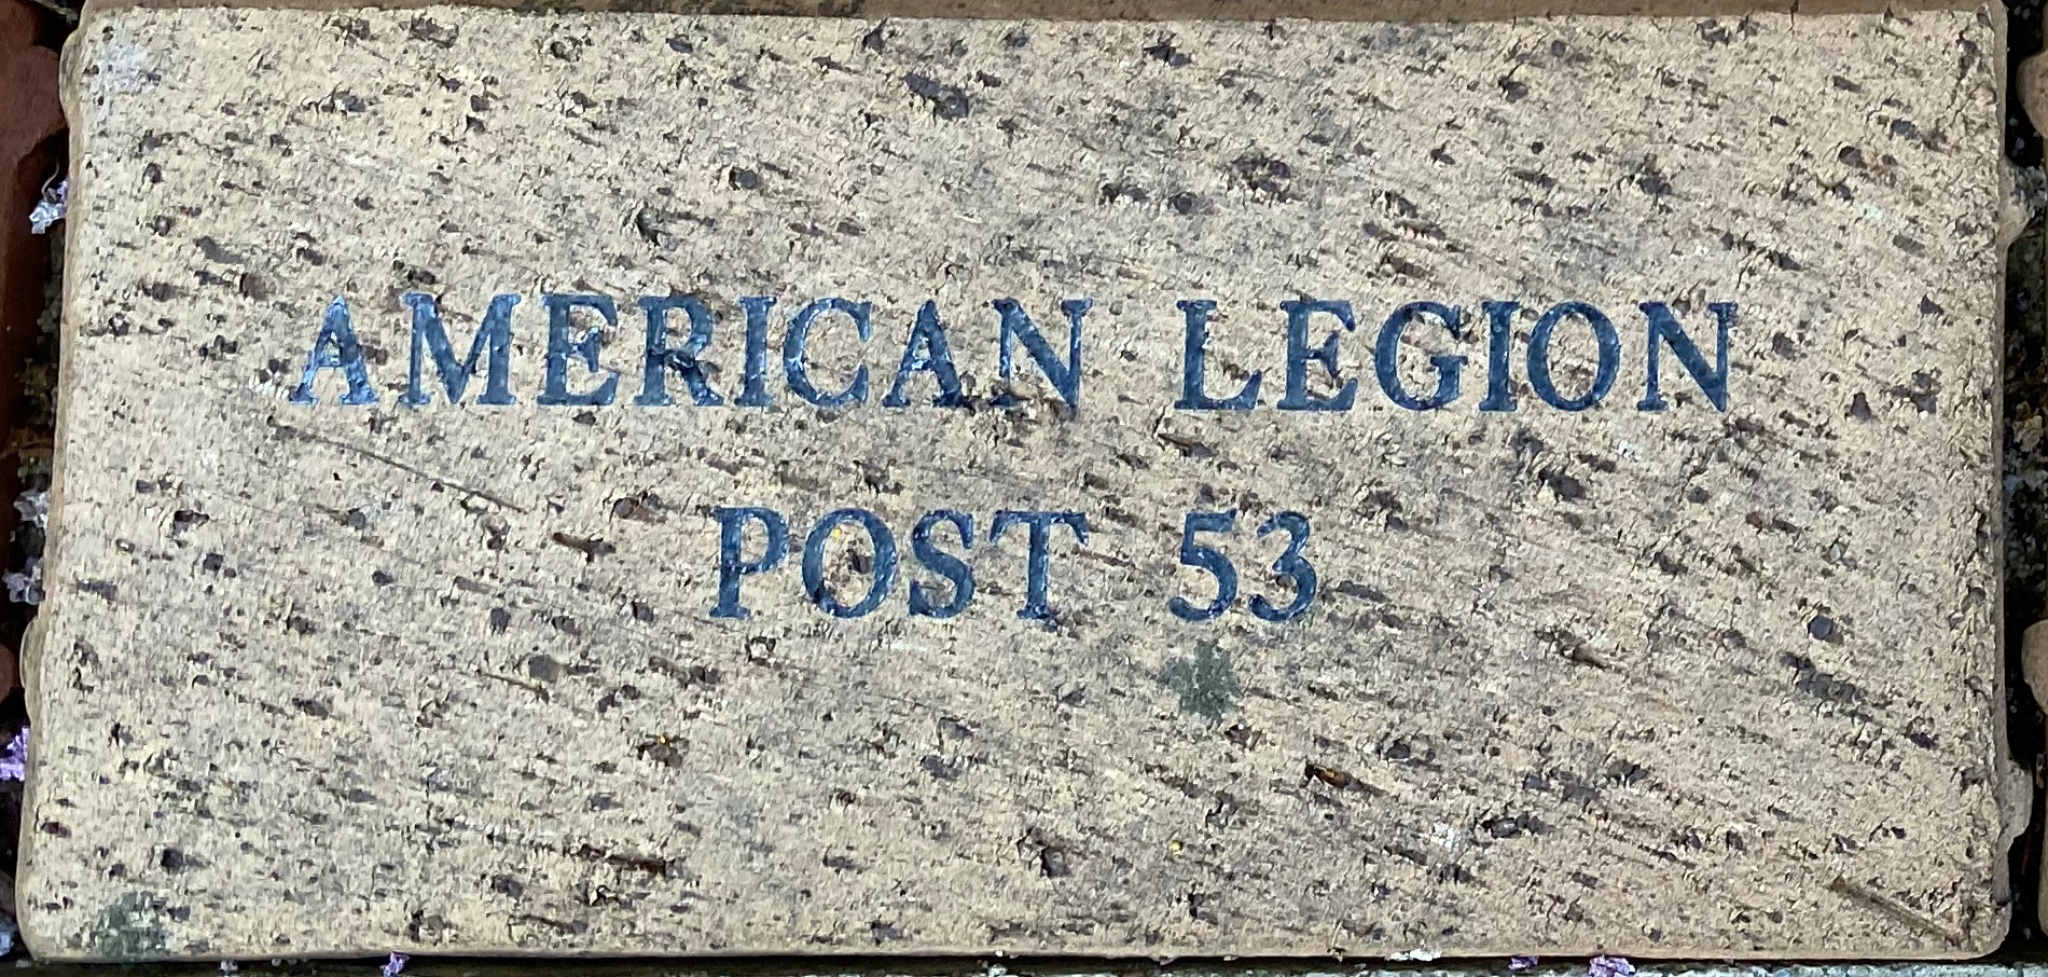 AMERICAN LEGION POST 53